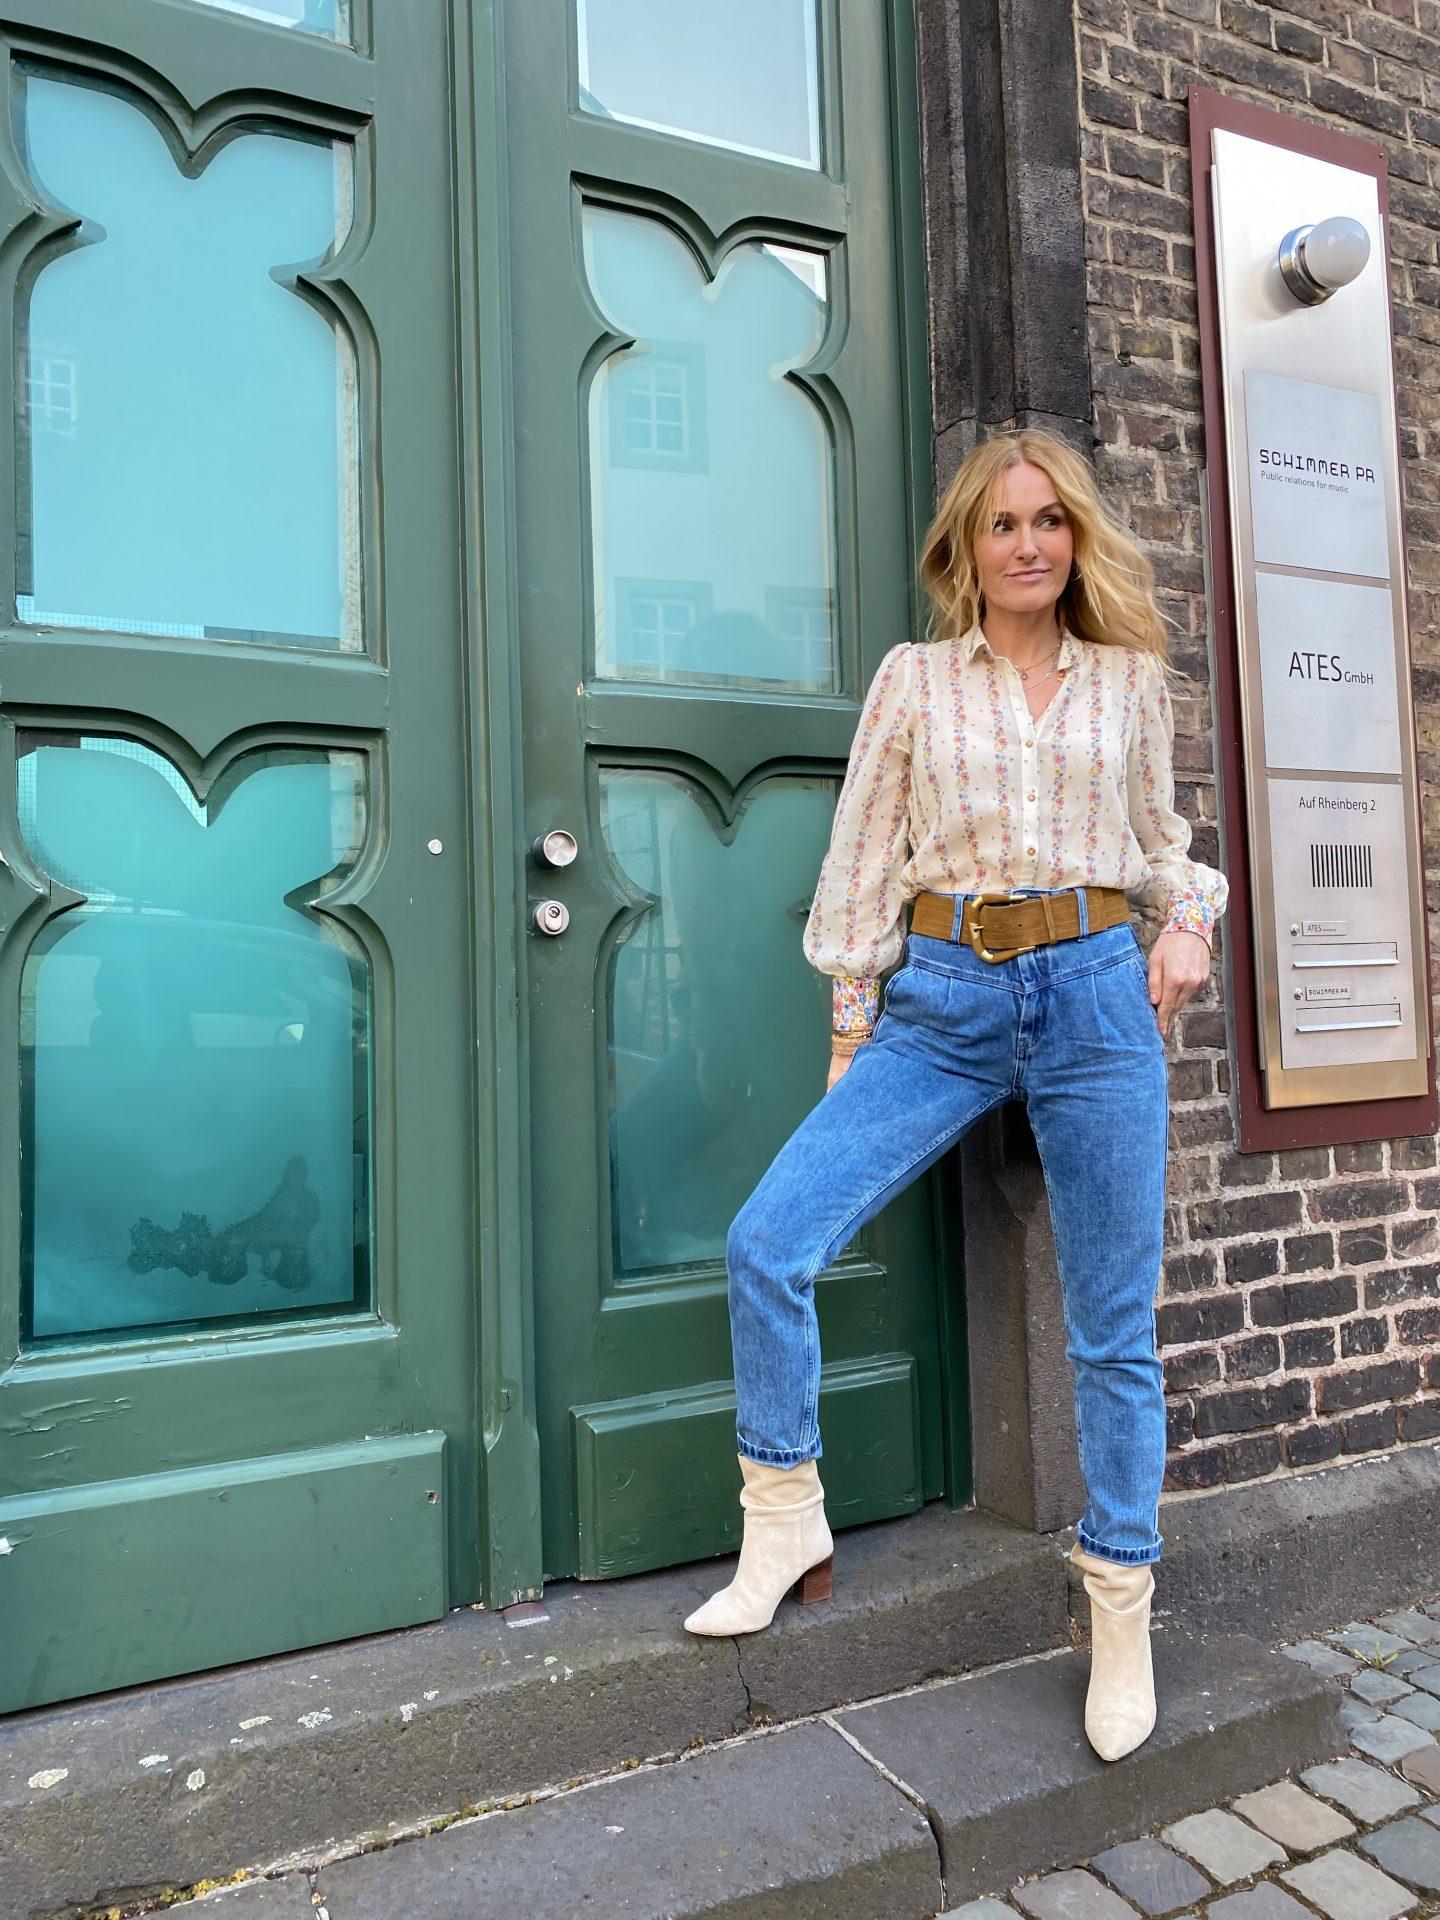 Sézane-Erfahrungen-Sam-Denim-Jeans-Bluse-Gürtel